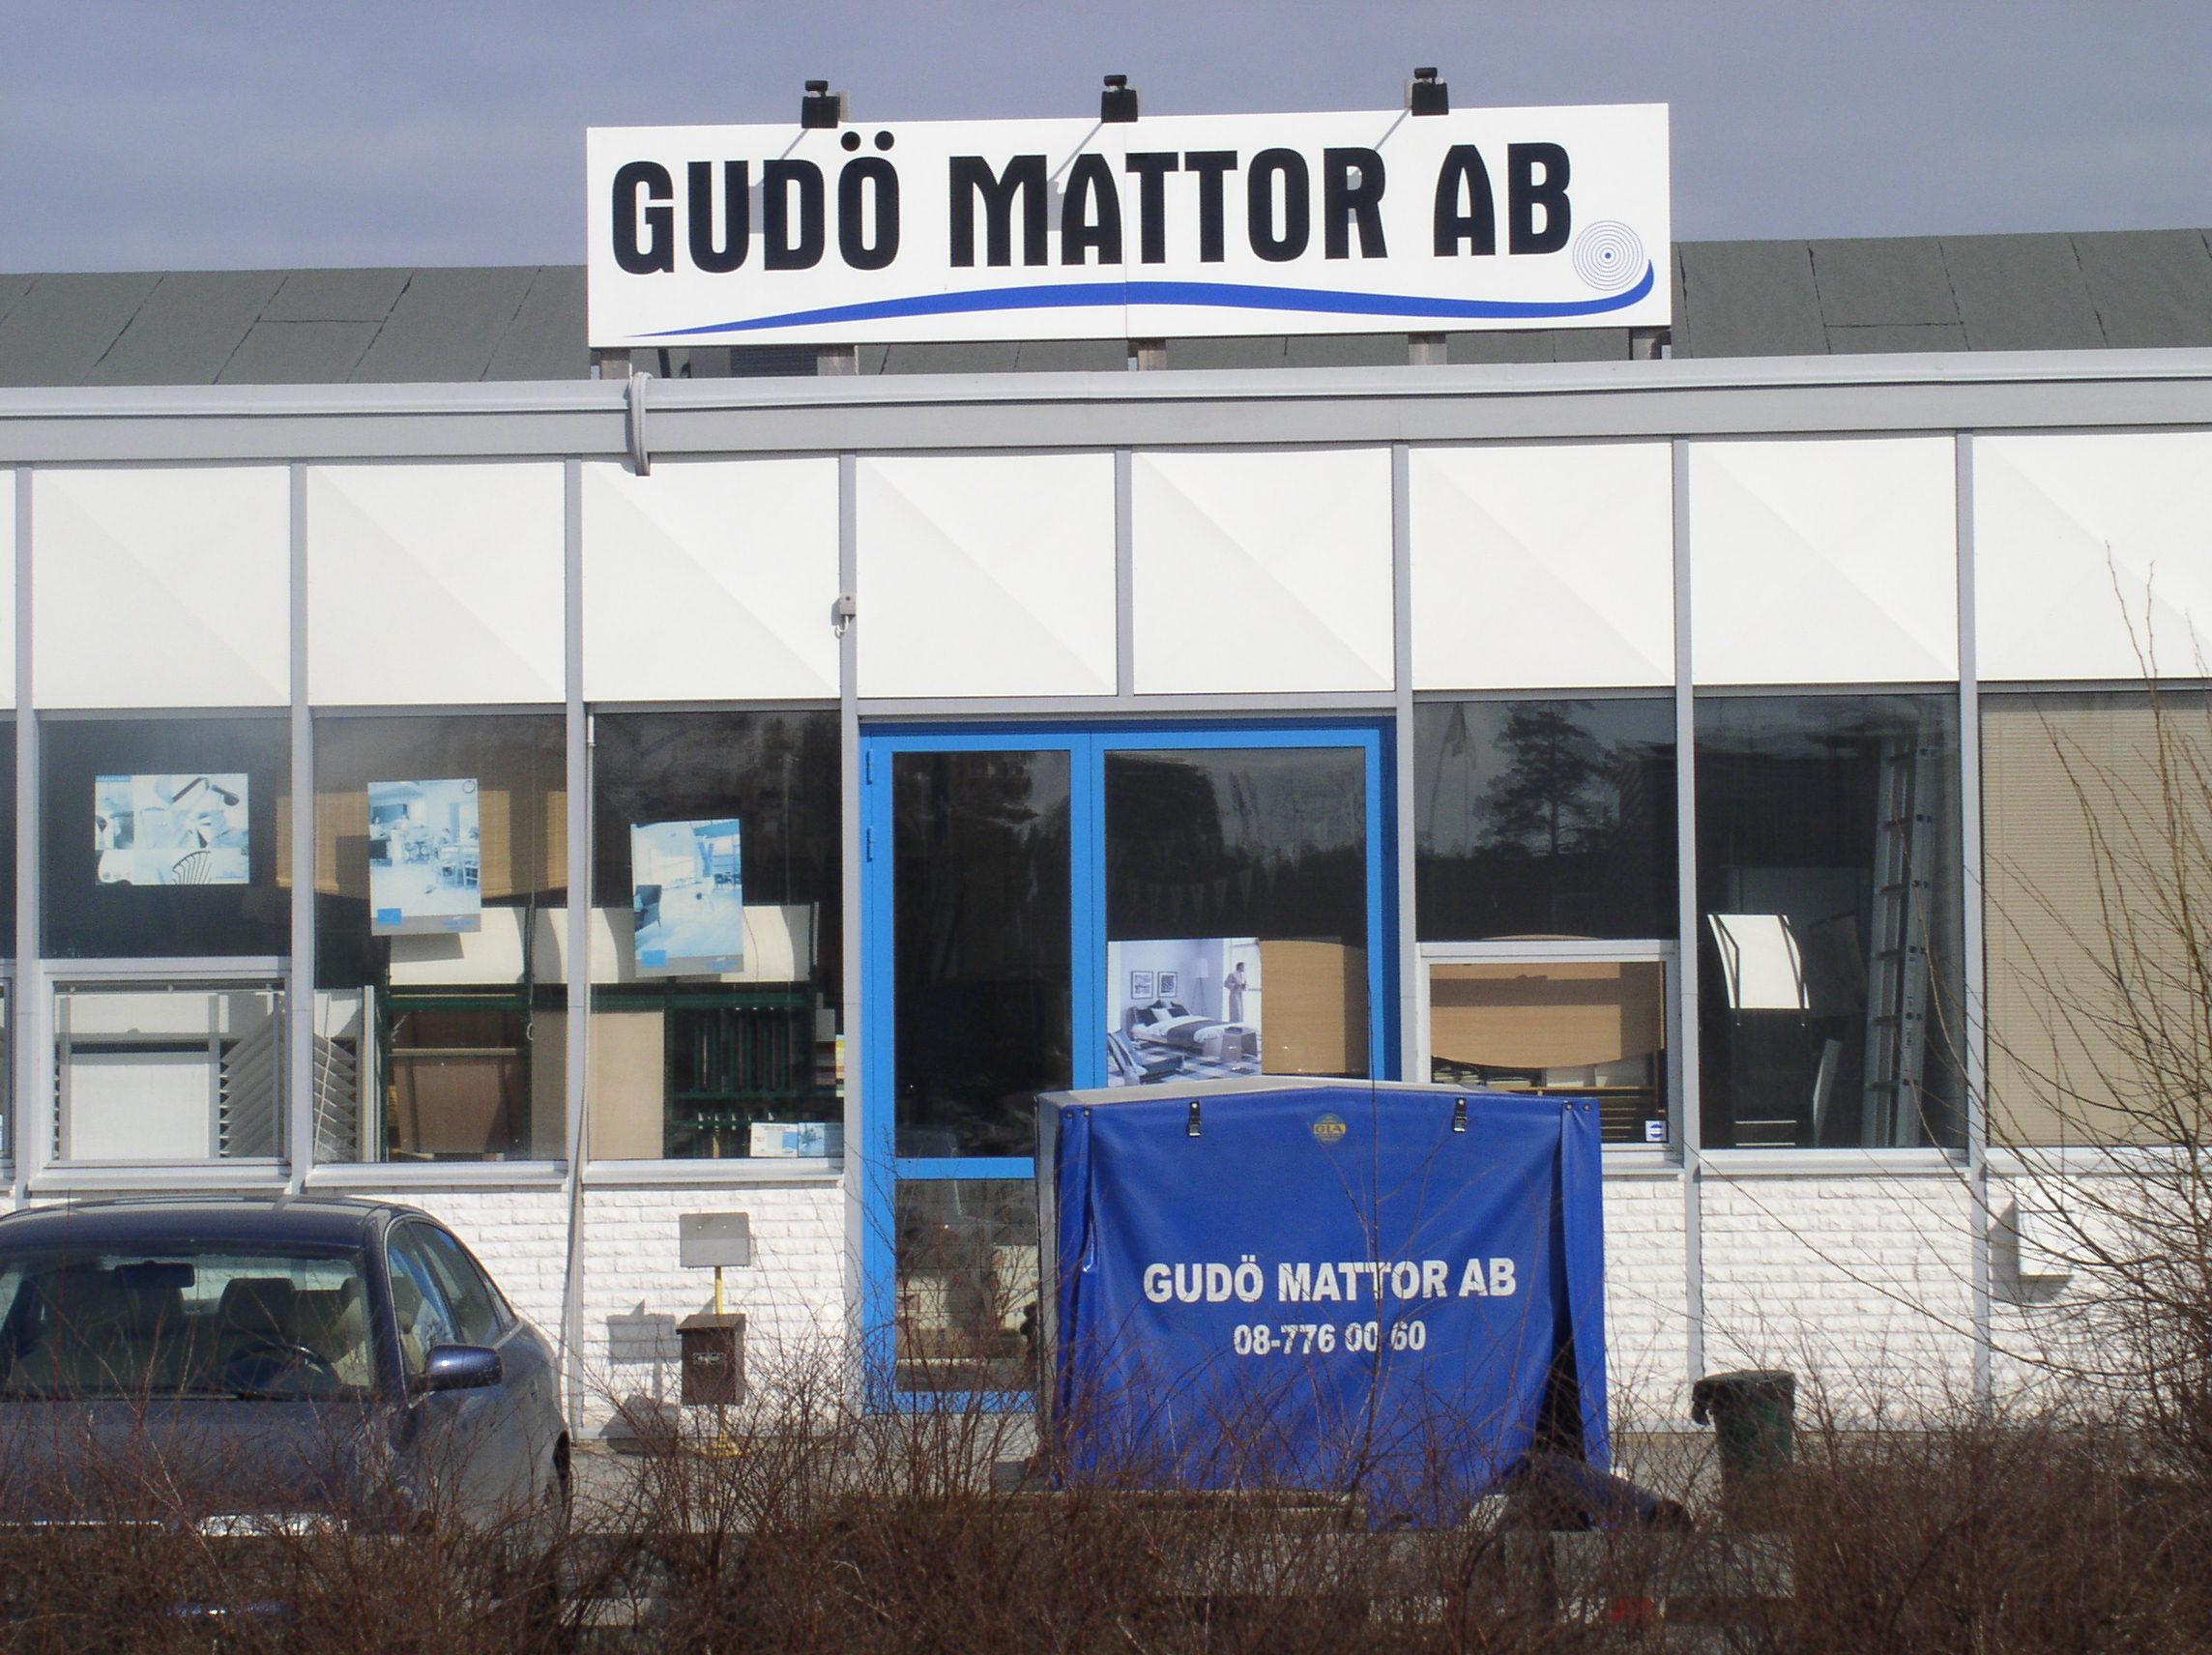 Gudö Mattor AB